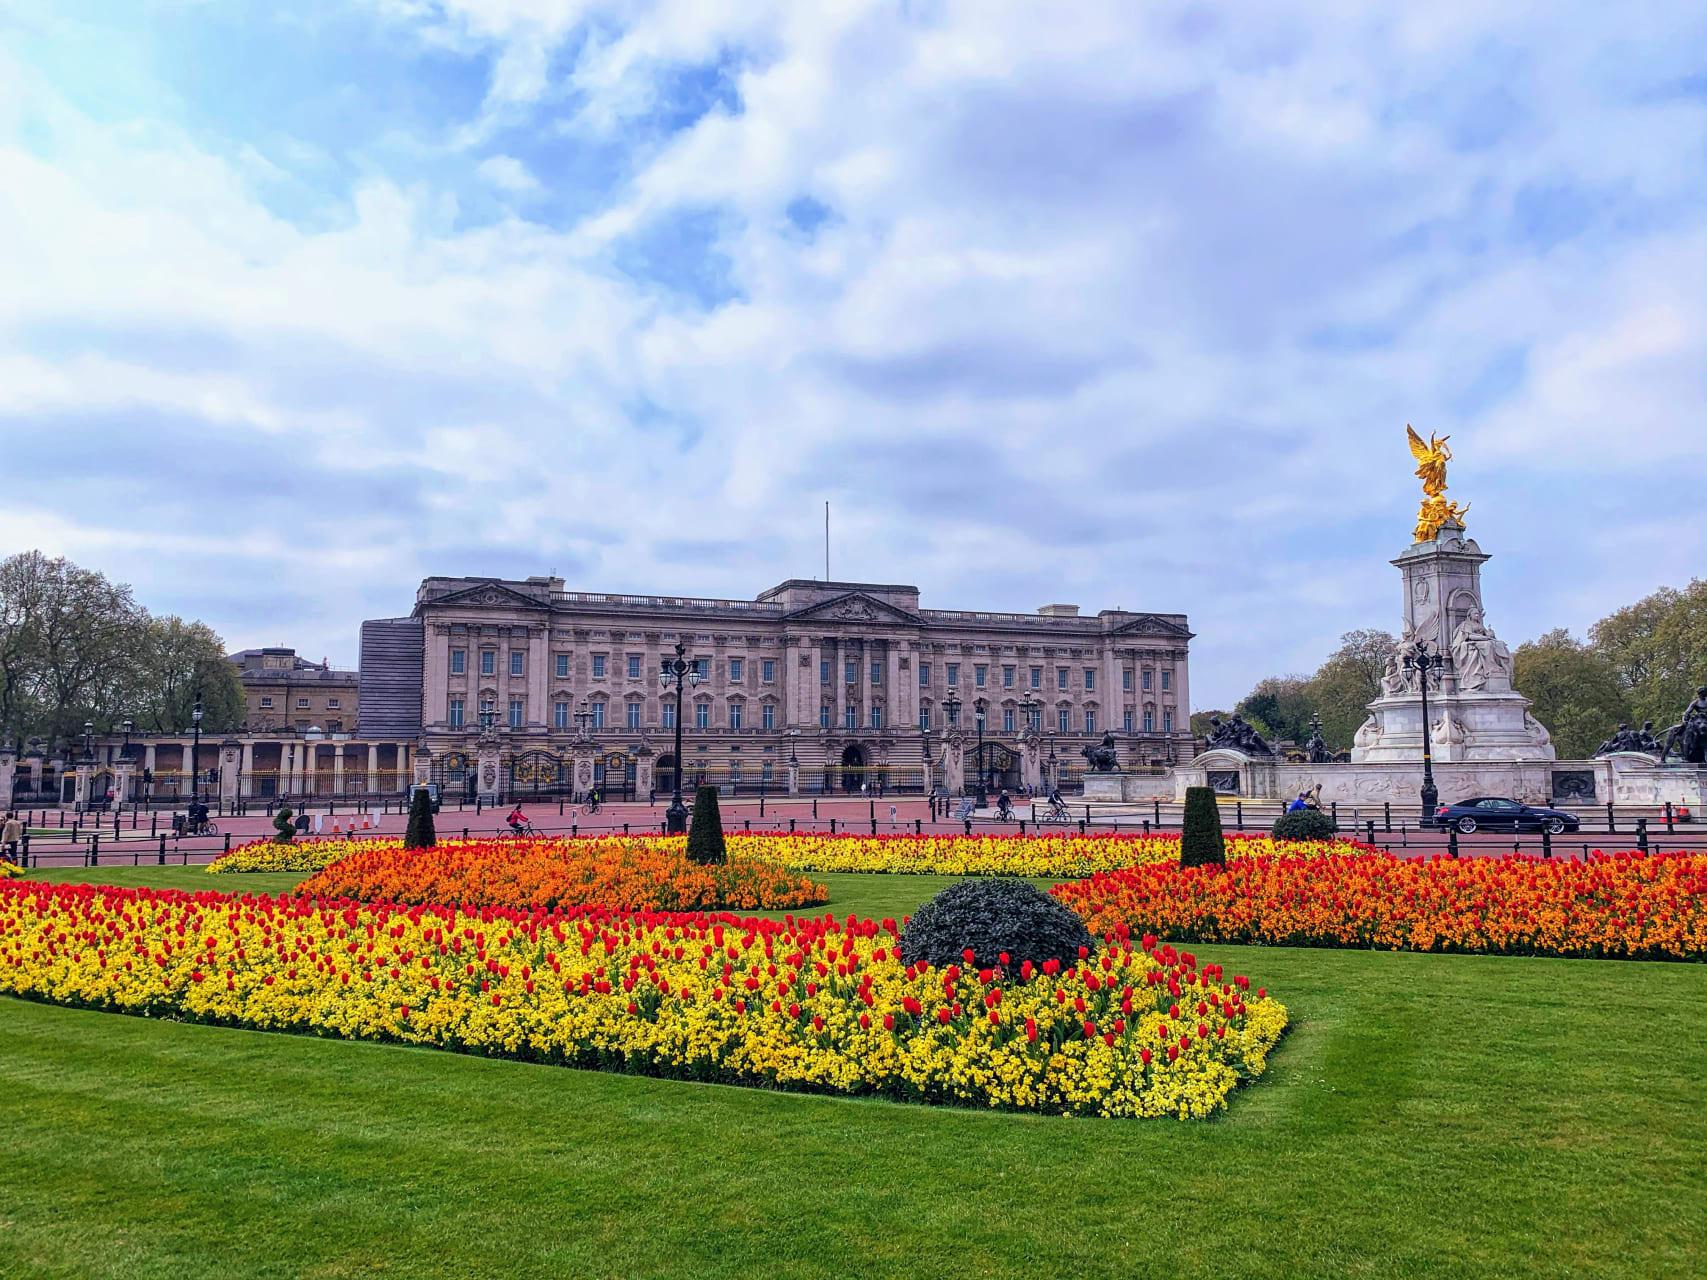 London - Garden City - St James's Park to Buckingham Palace